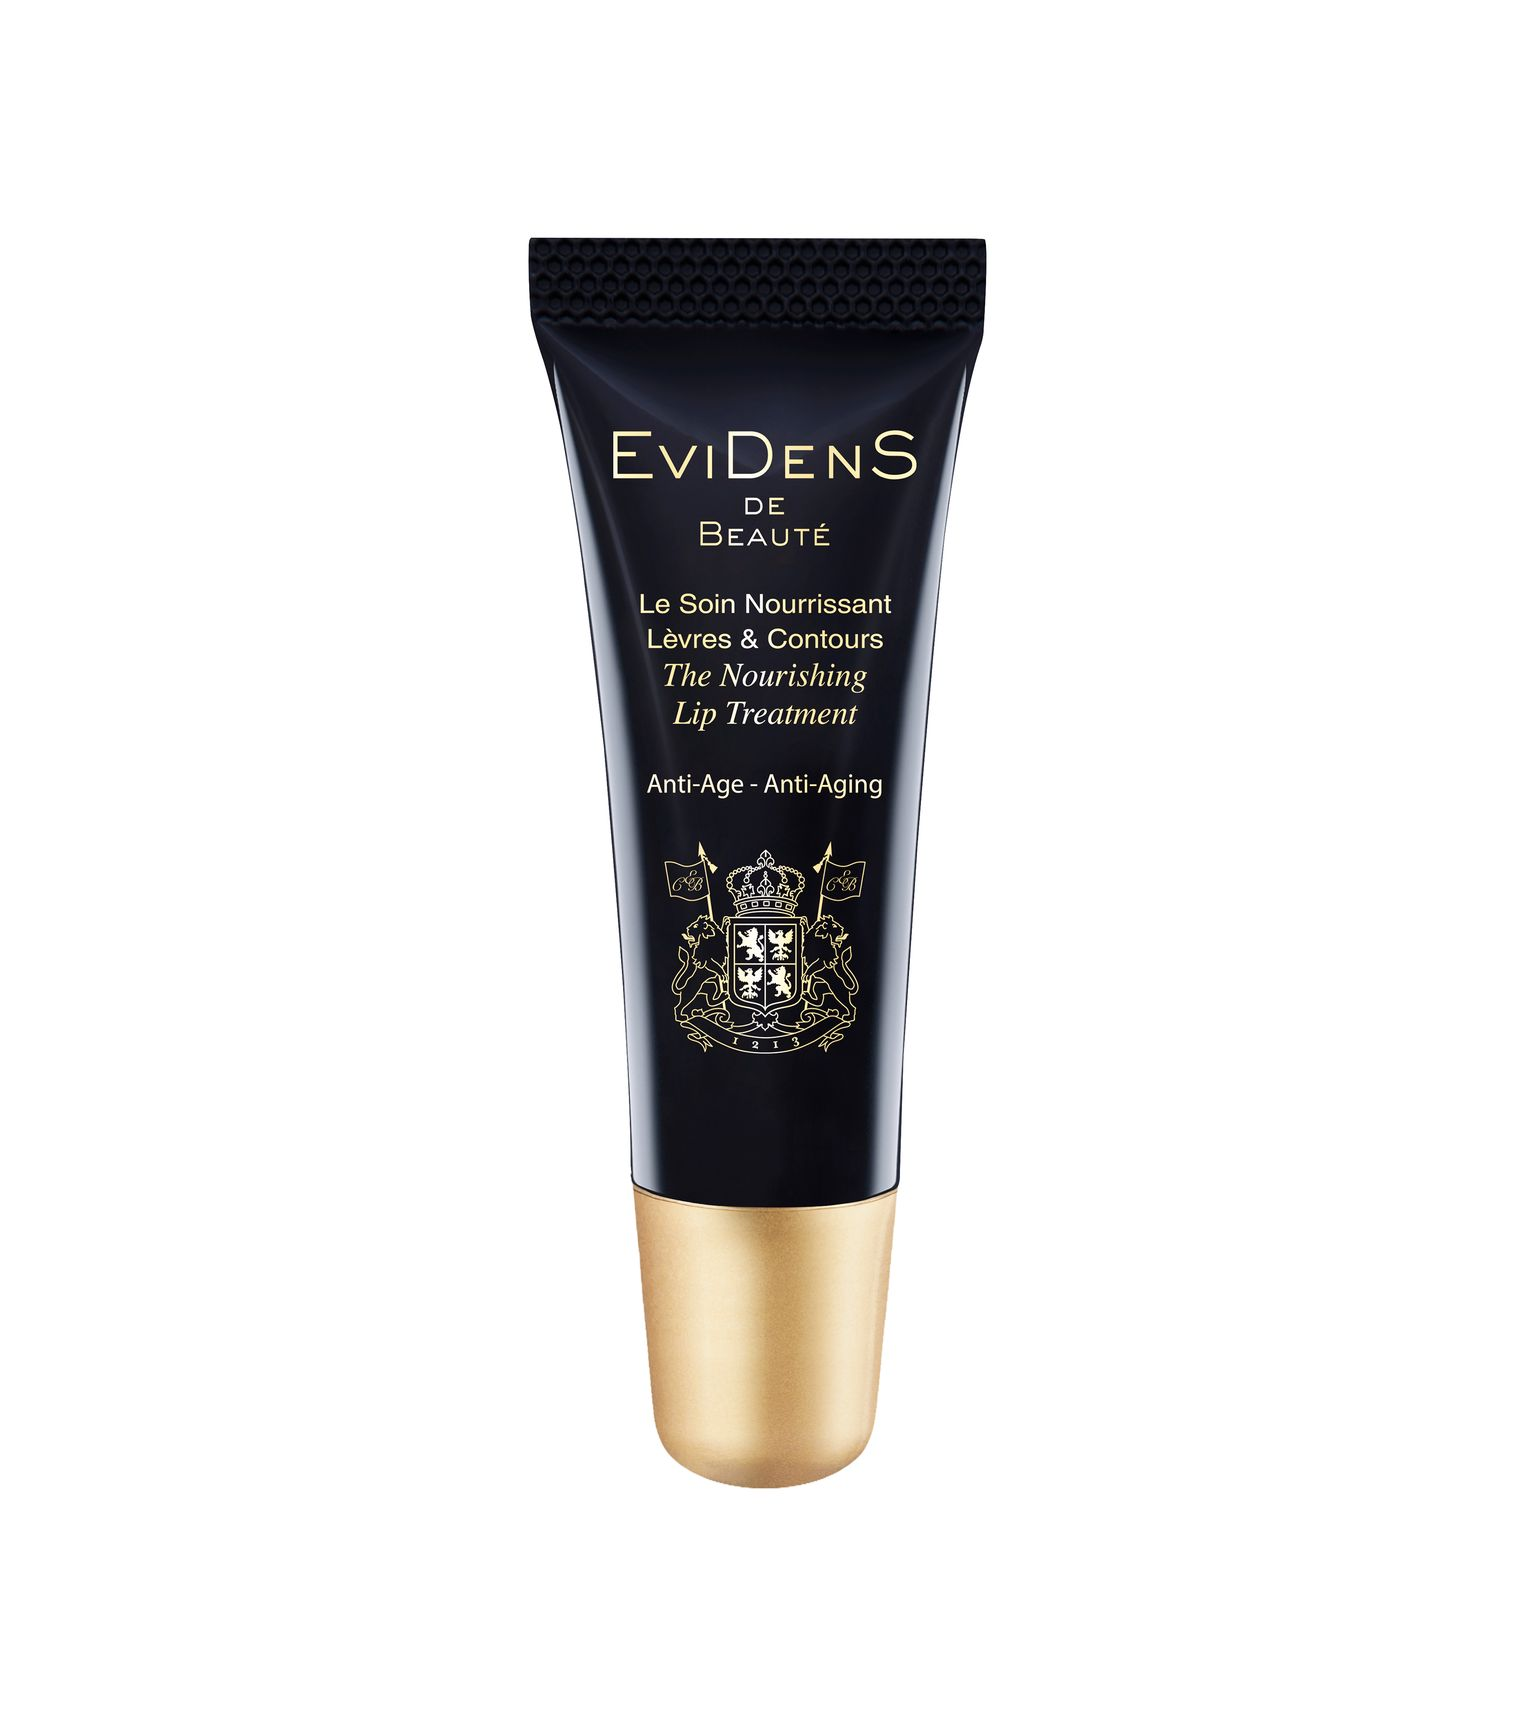 EviDenS de Beauté - Nourishing Lip Treatment - Lippenpflege